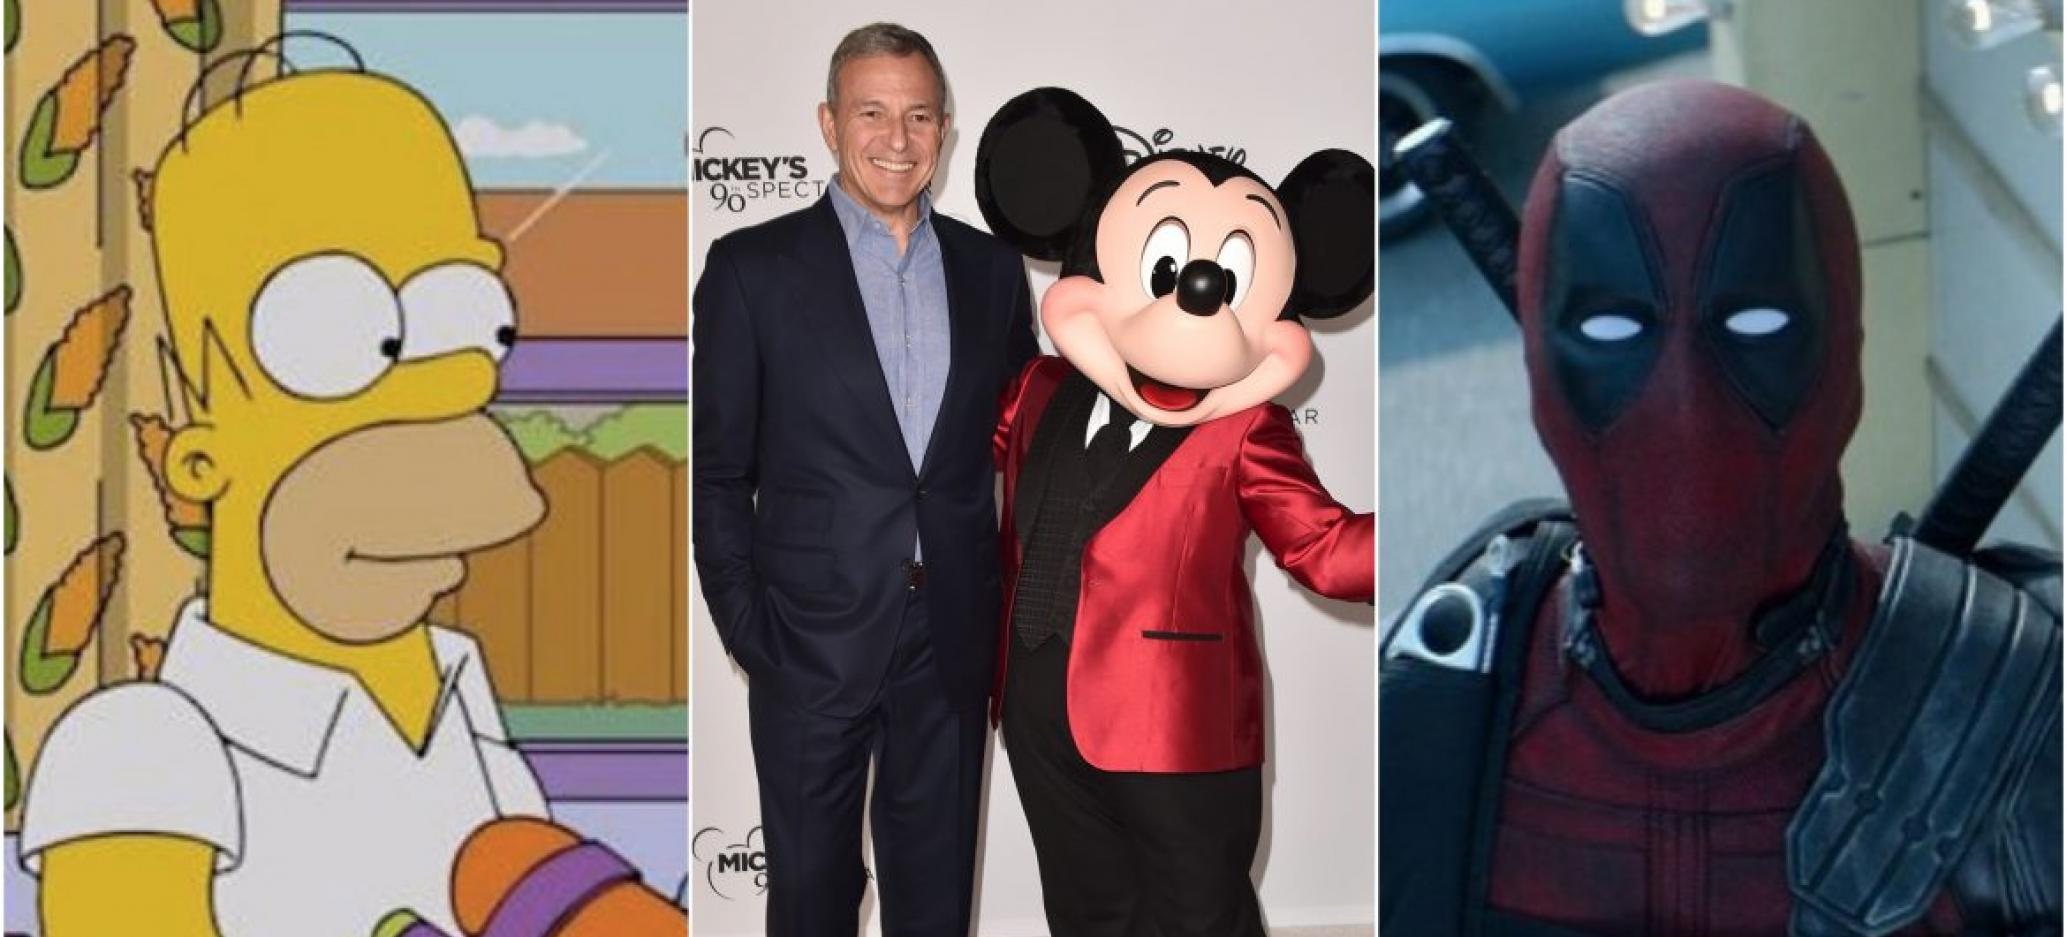 Disney Buys 21st Century Fox for $71 Billion